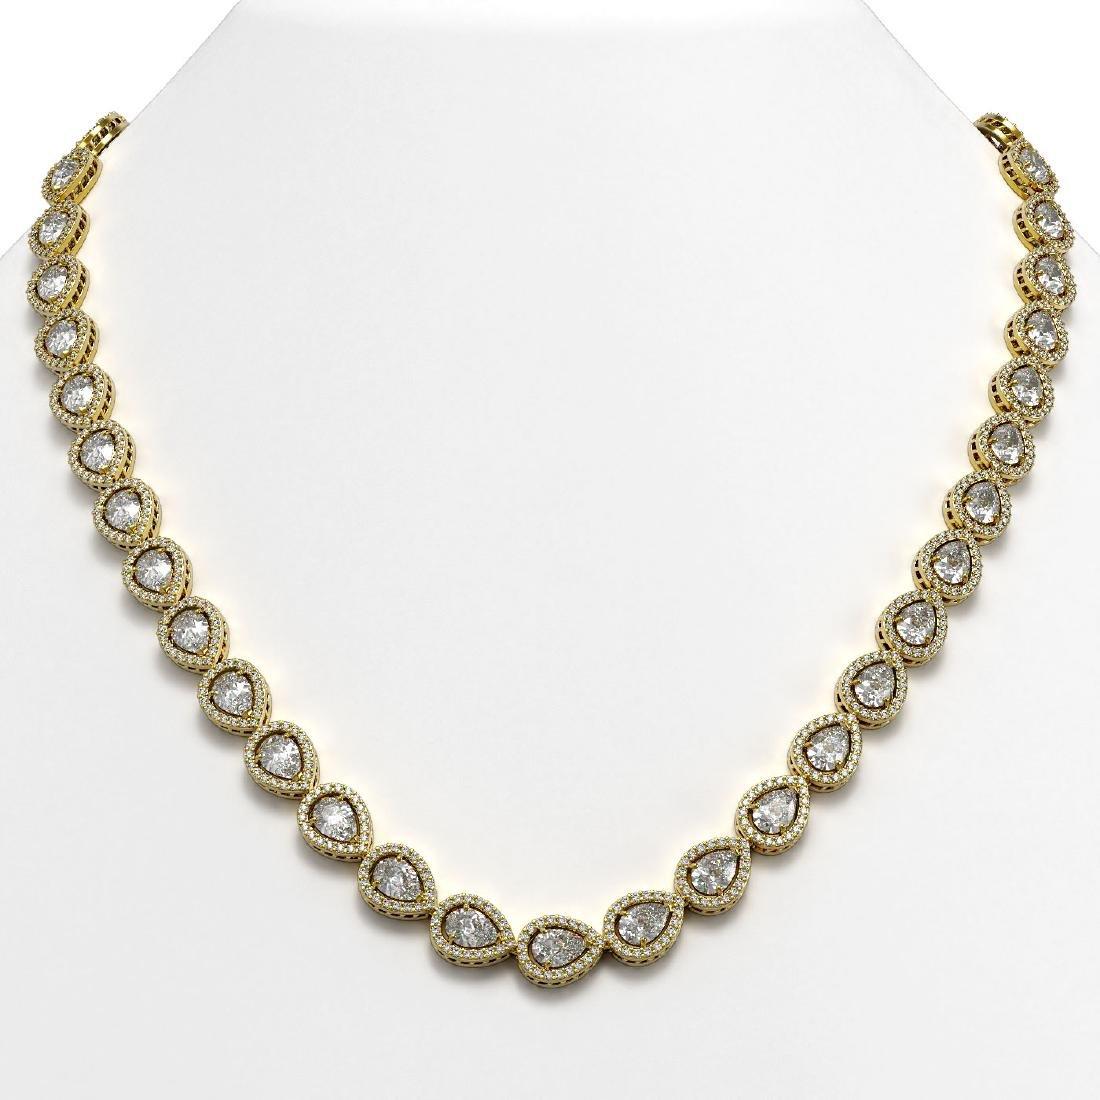 28.74 CTW Pear Diamond Designer Necklace 18K Yellow